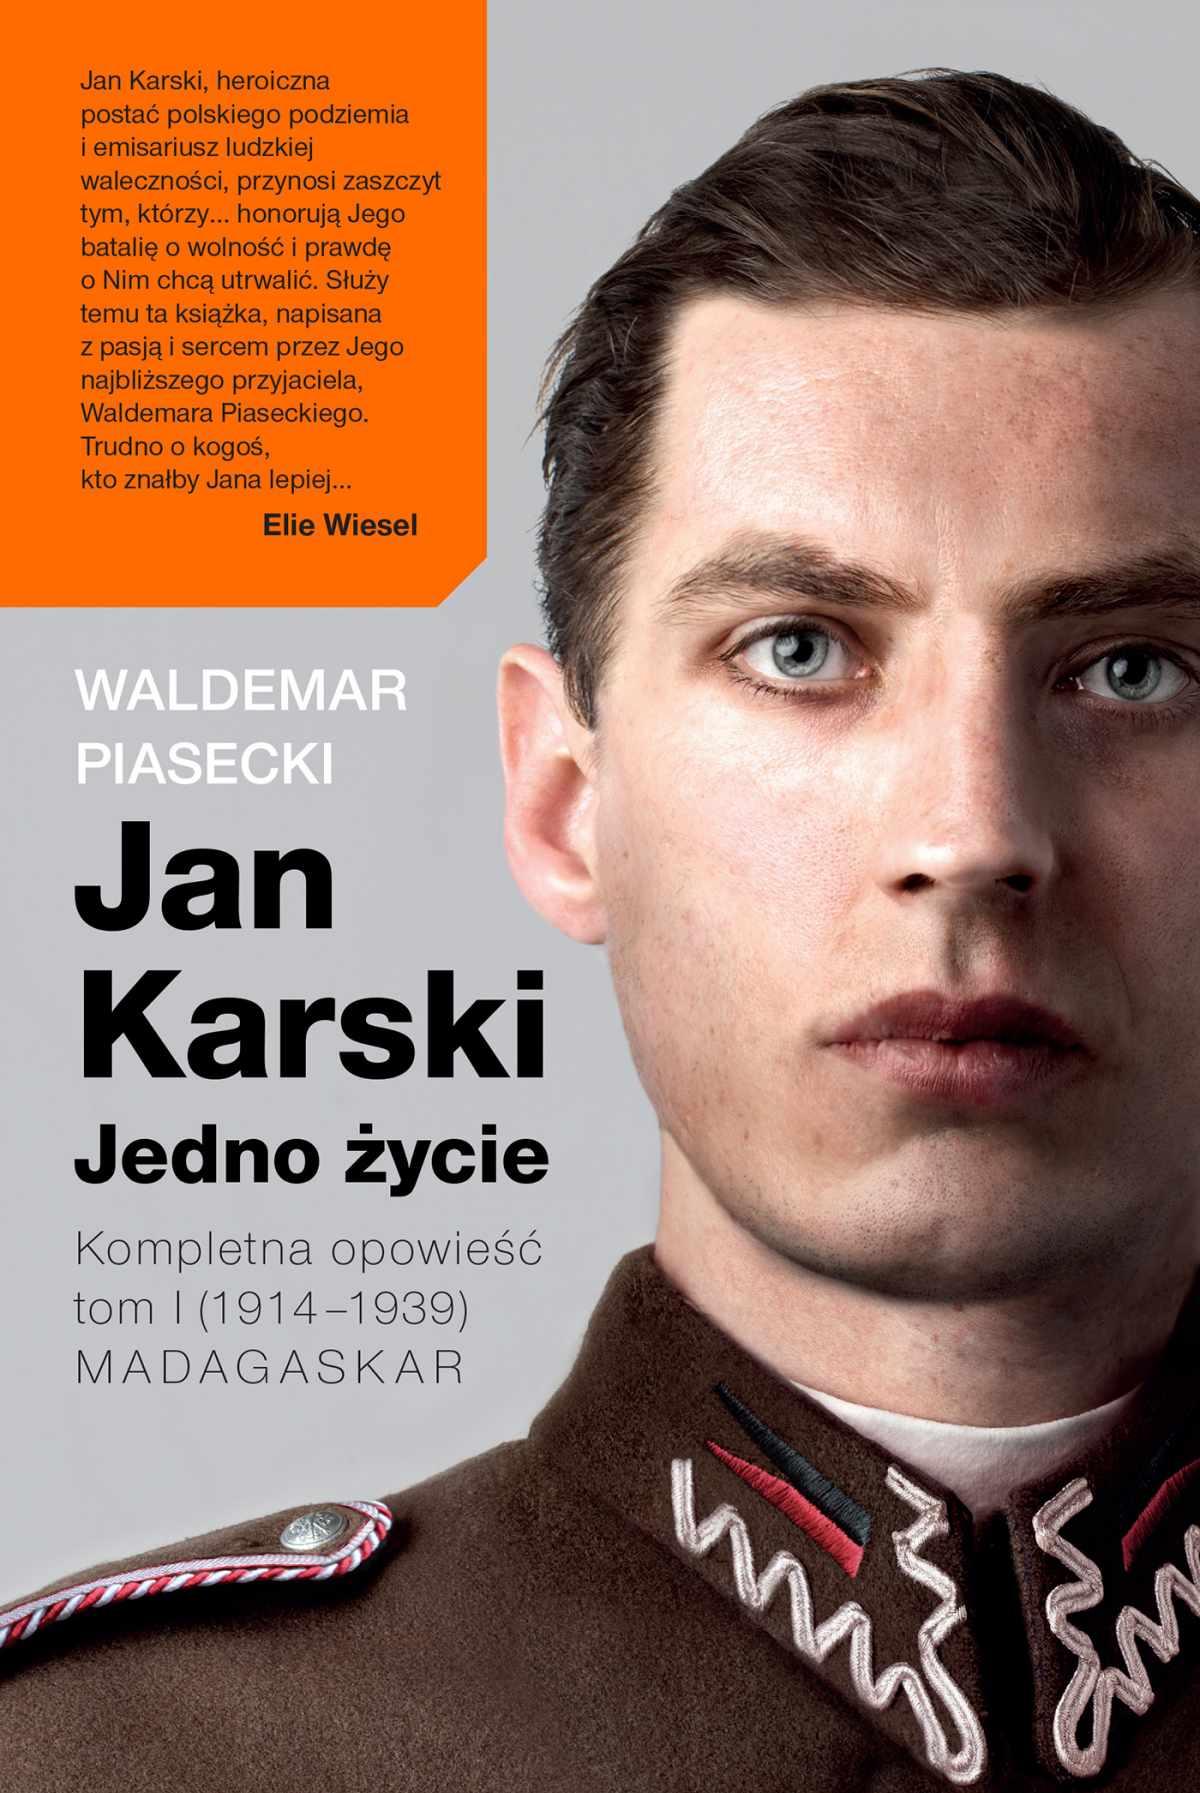 Jan Karski. Jedno życie. Tom 1. Madagaskar - Ebook (Książka EPUB) do pobrania w formacie EPUB